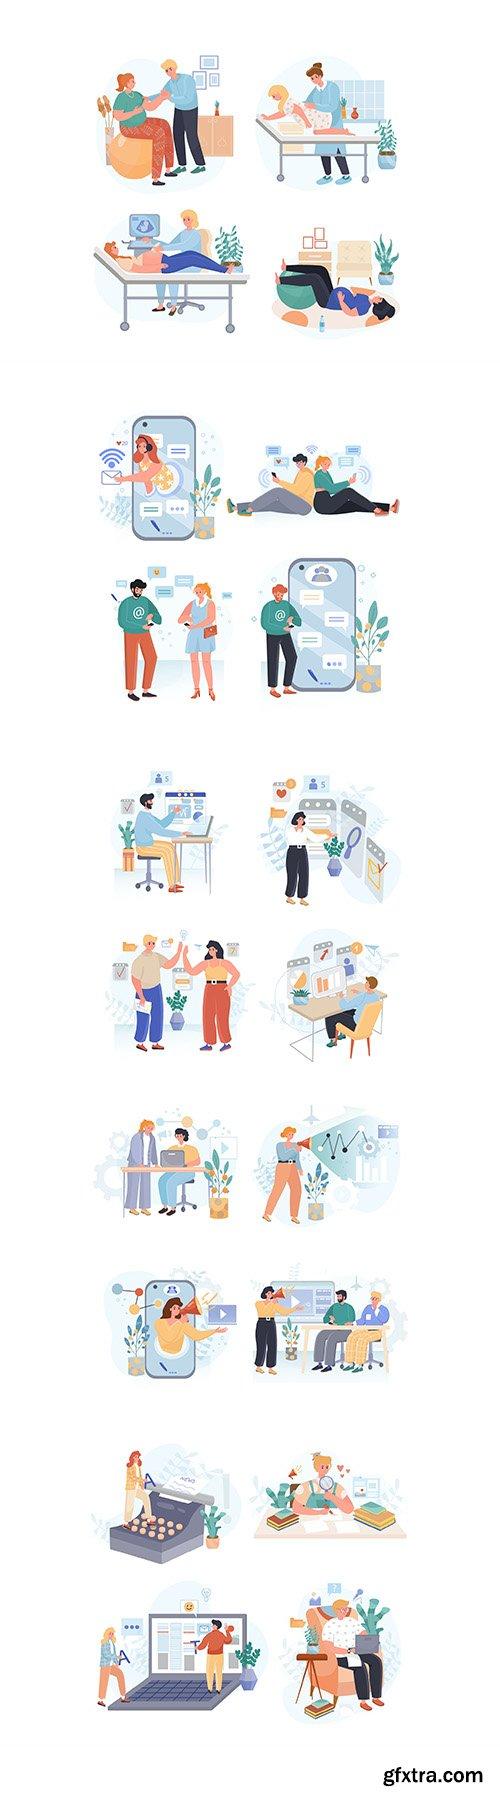 People activity illustrations set Vol2